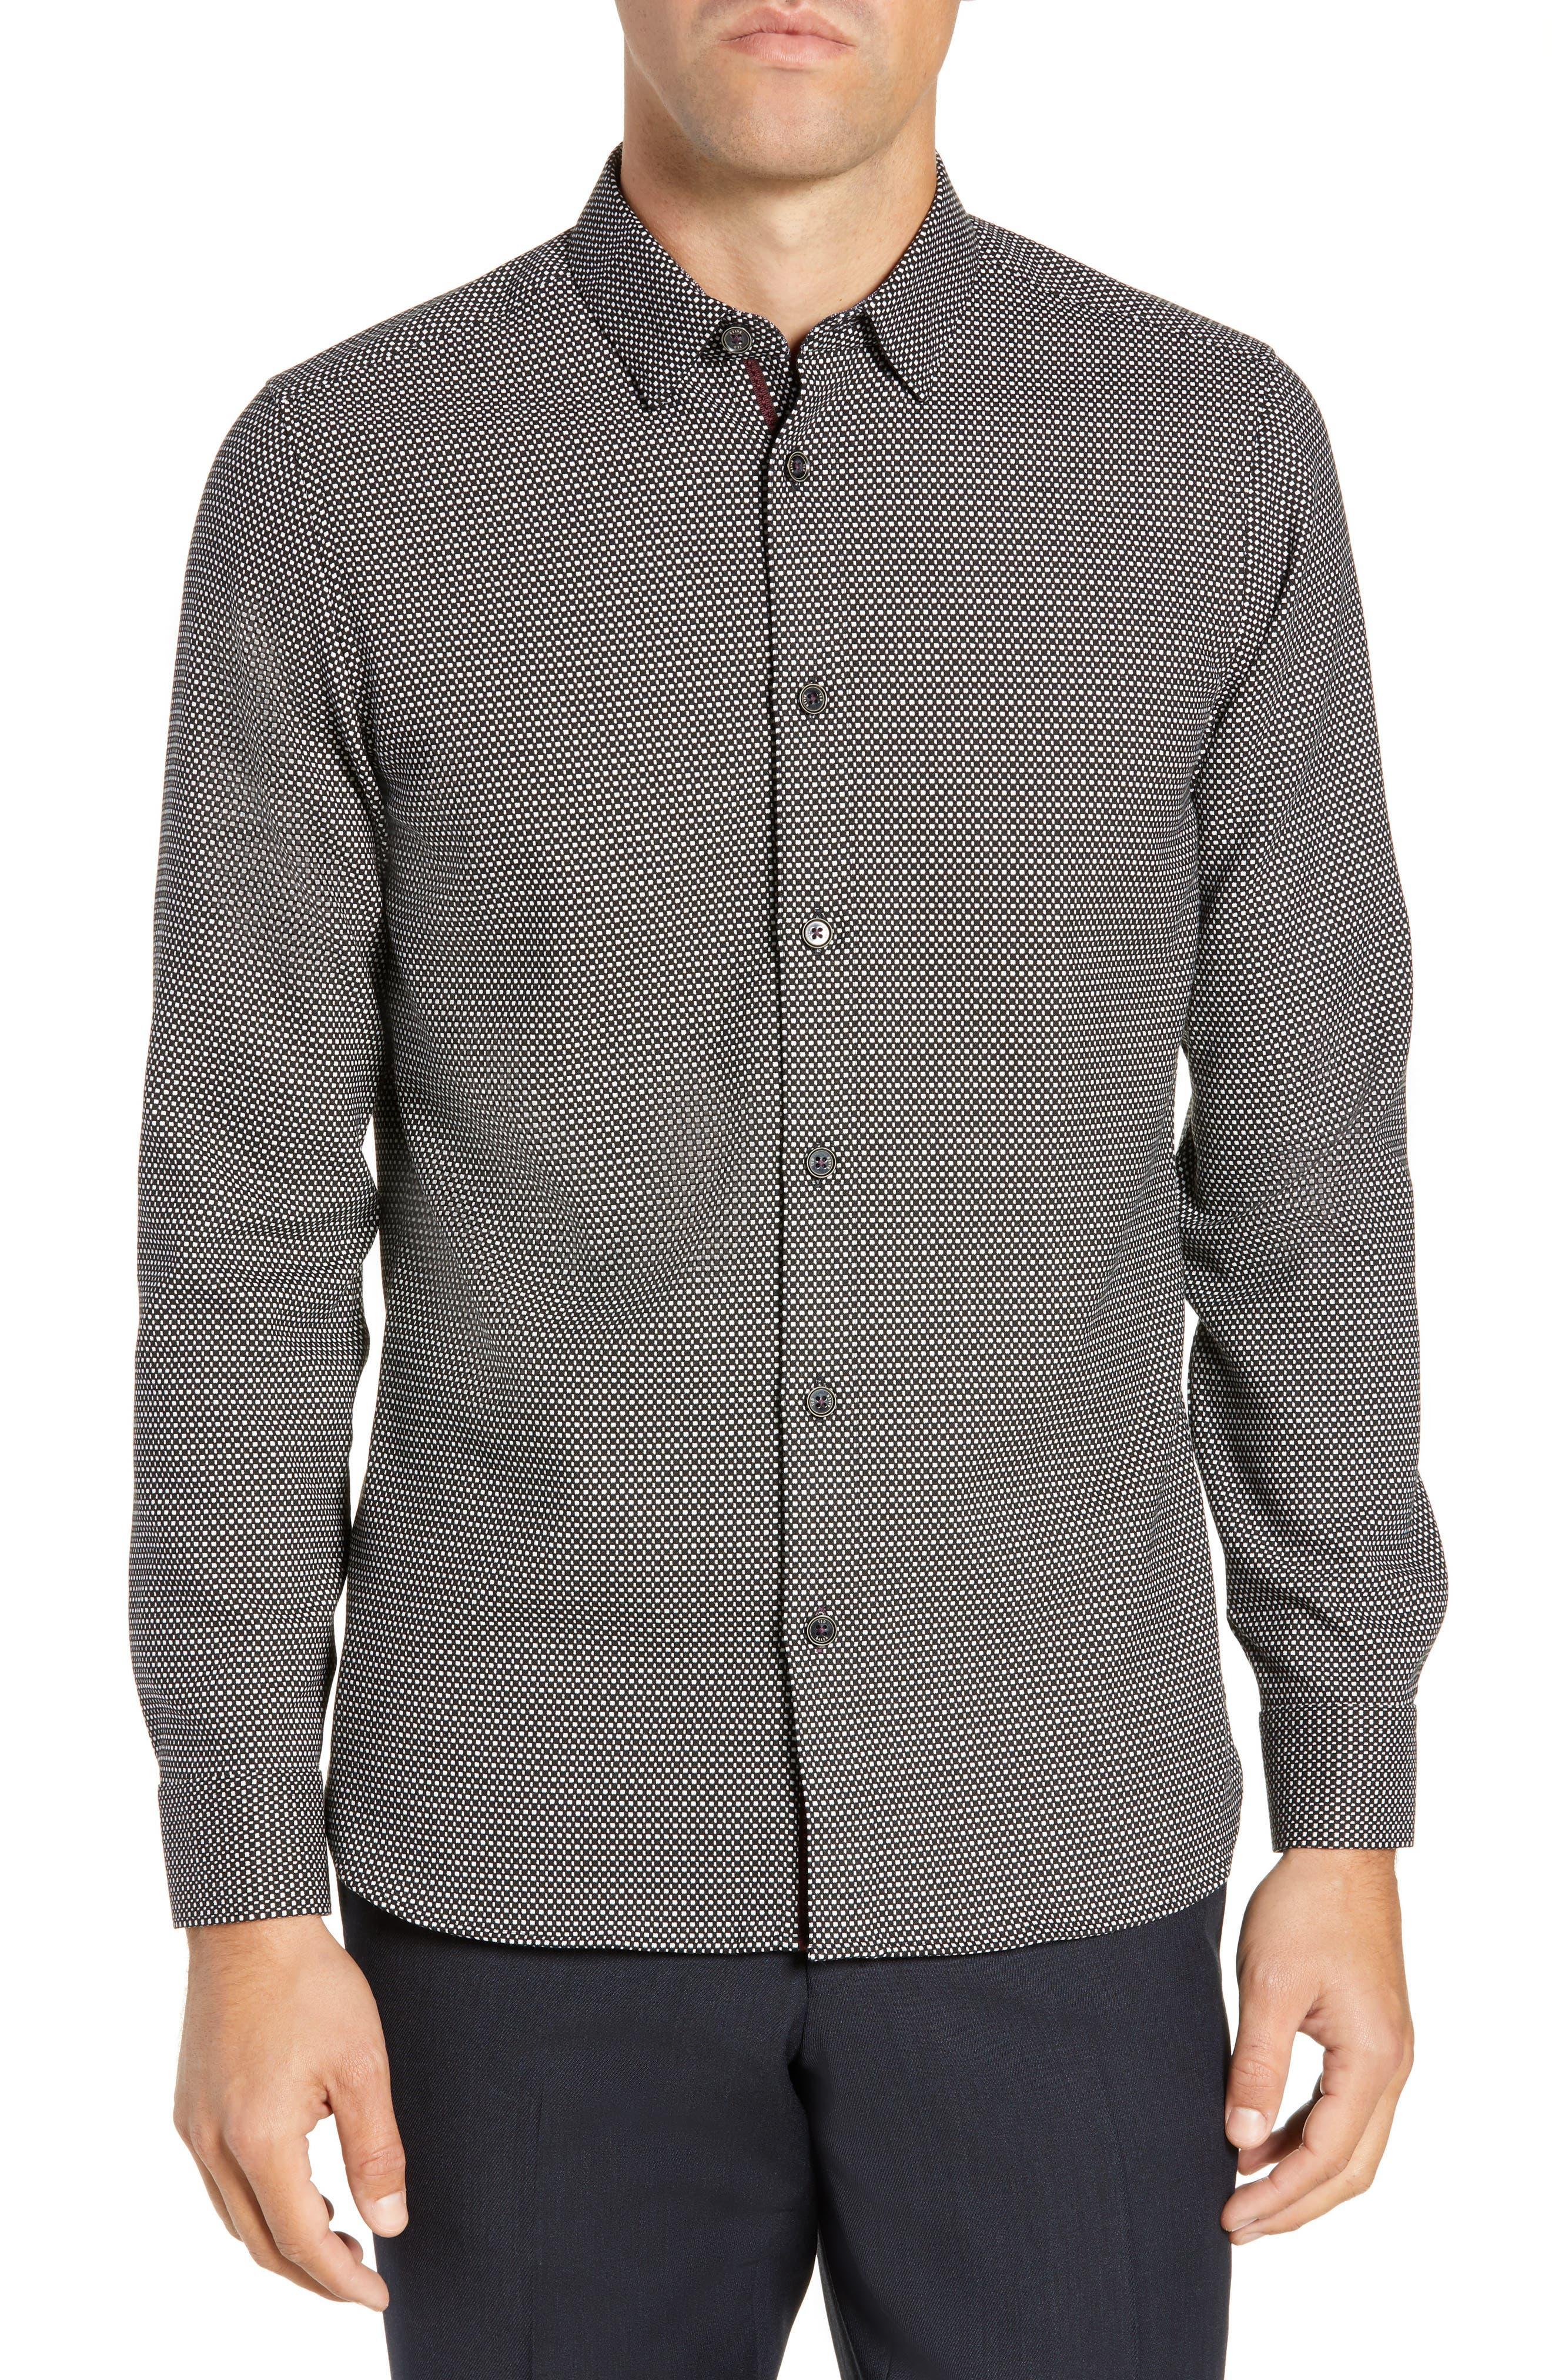 Wapping Slim Fit Textured Shirt,                             Main thumbnail 1, color,                             BLACK